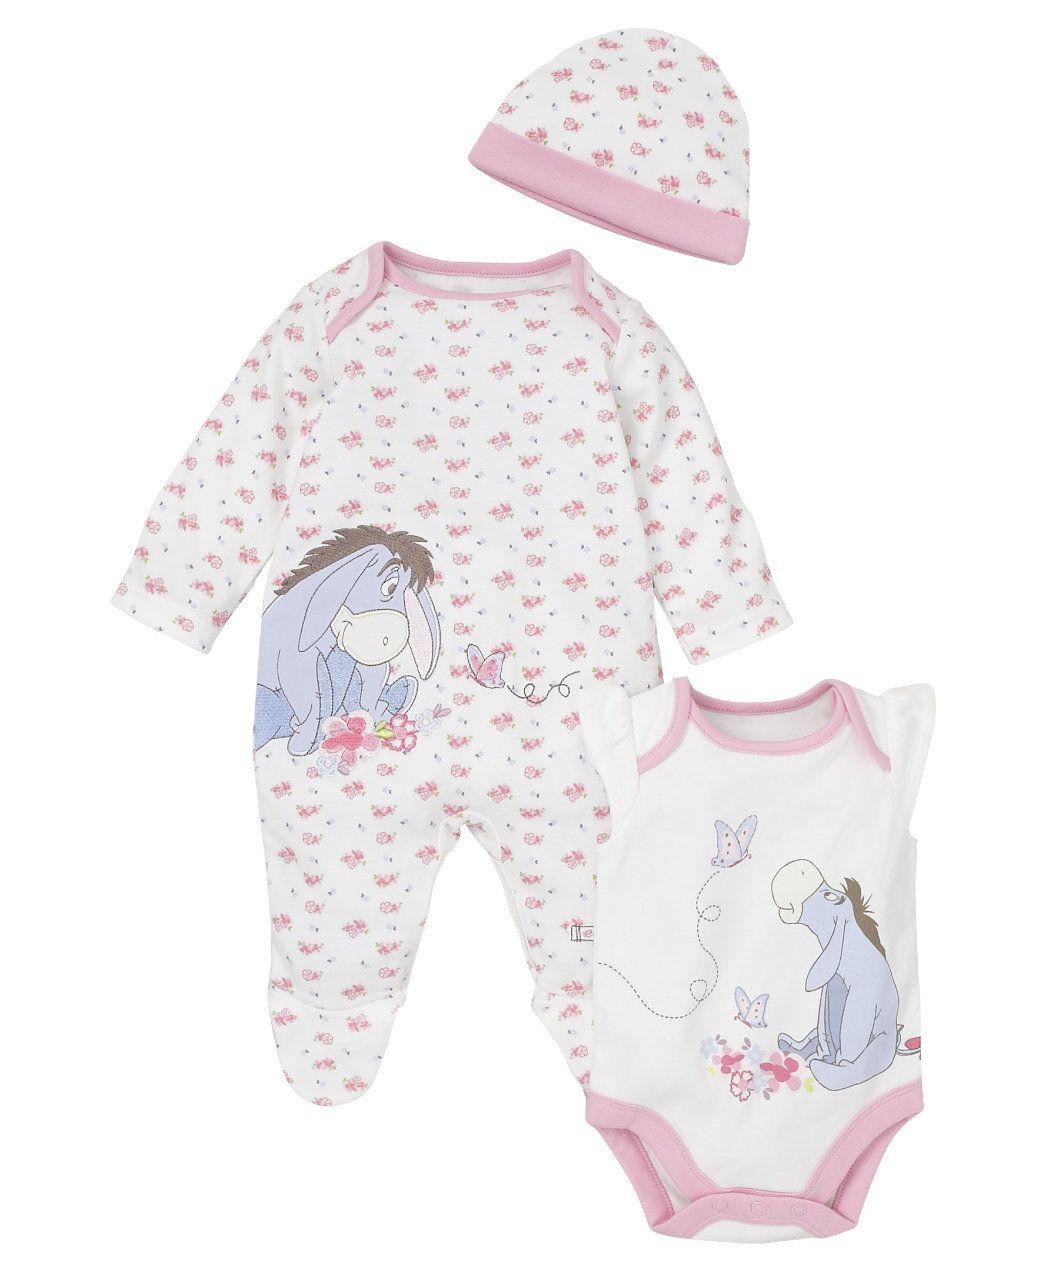 248fd61d Eeyore Set - 3 Piece Set - co-ordinated sets - Mothercare   Baby ...